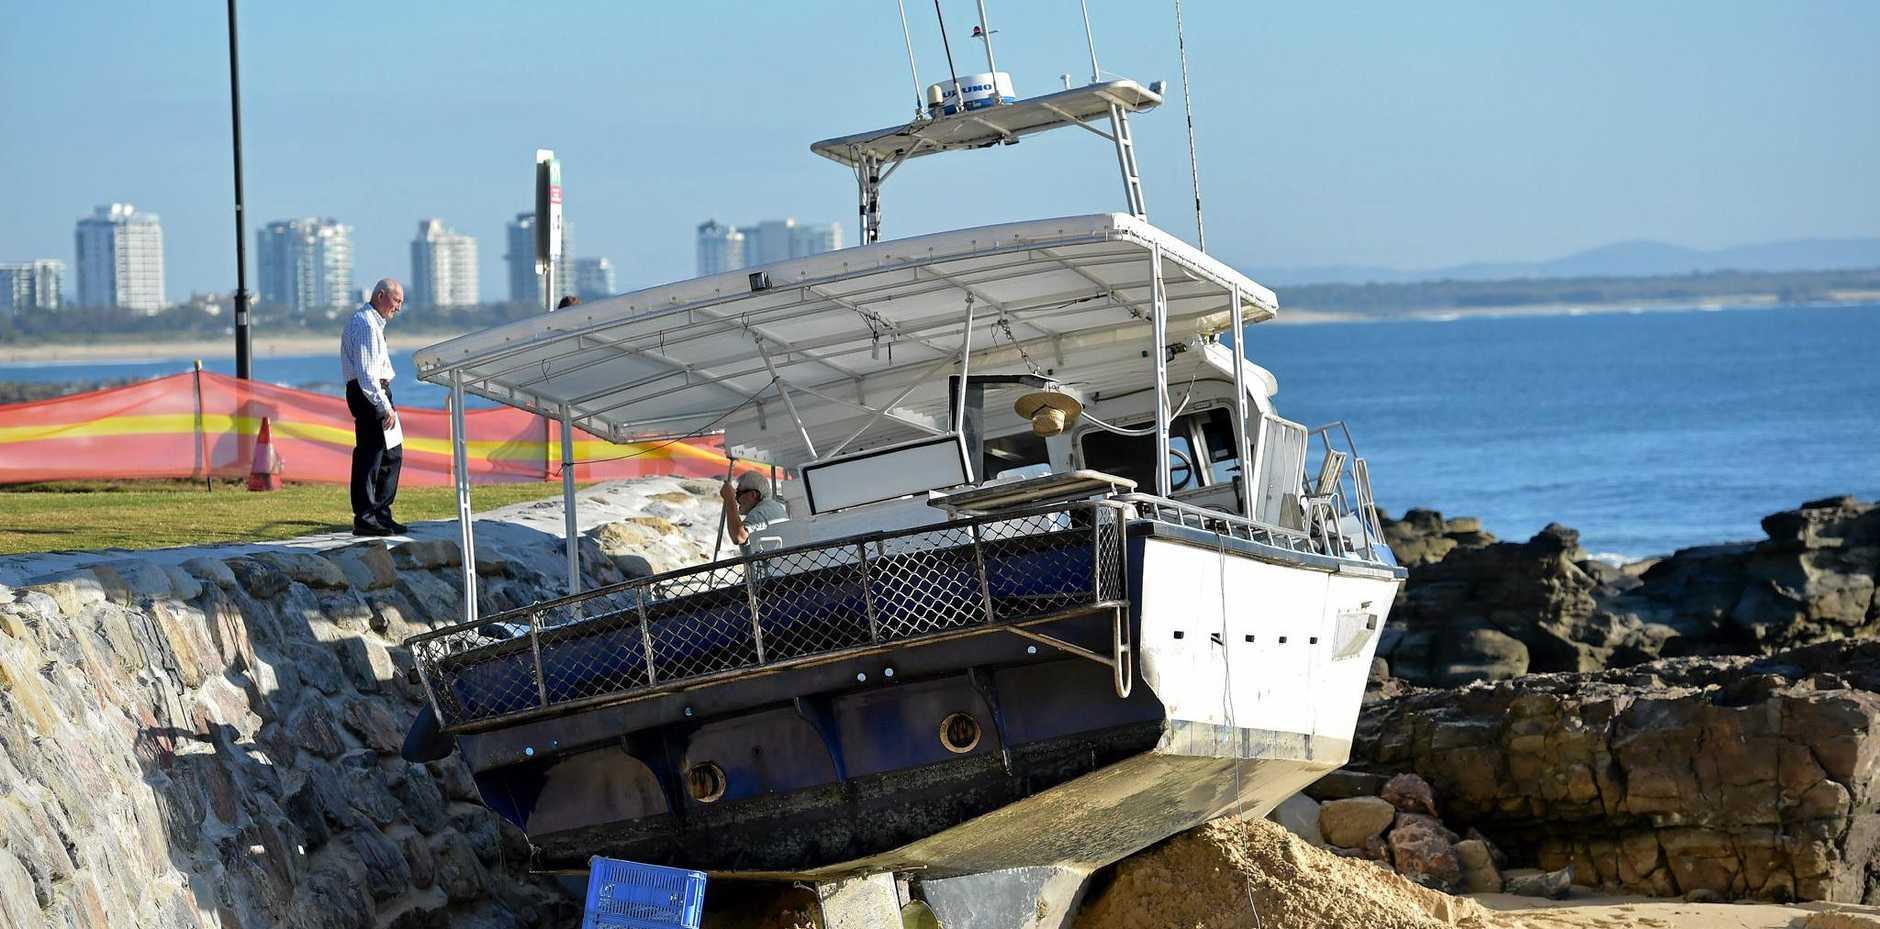 The Matahari fishing boat makes an unscheduled landing on Mooloolaba Beach.